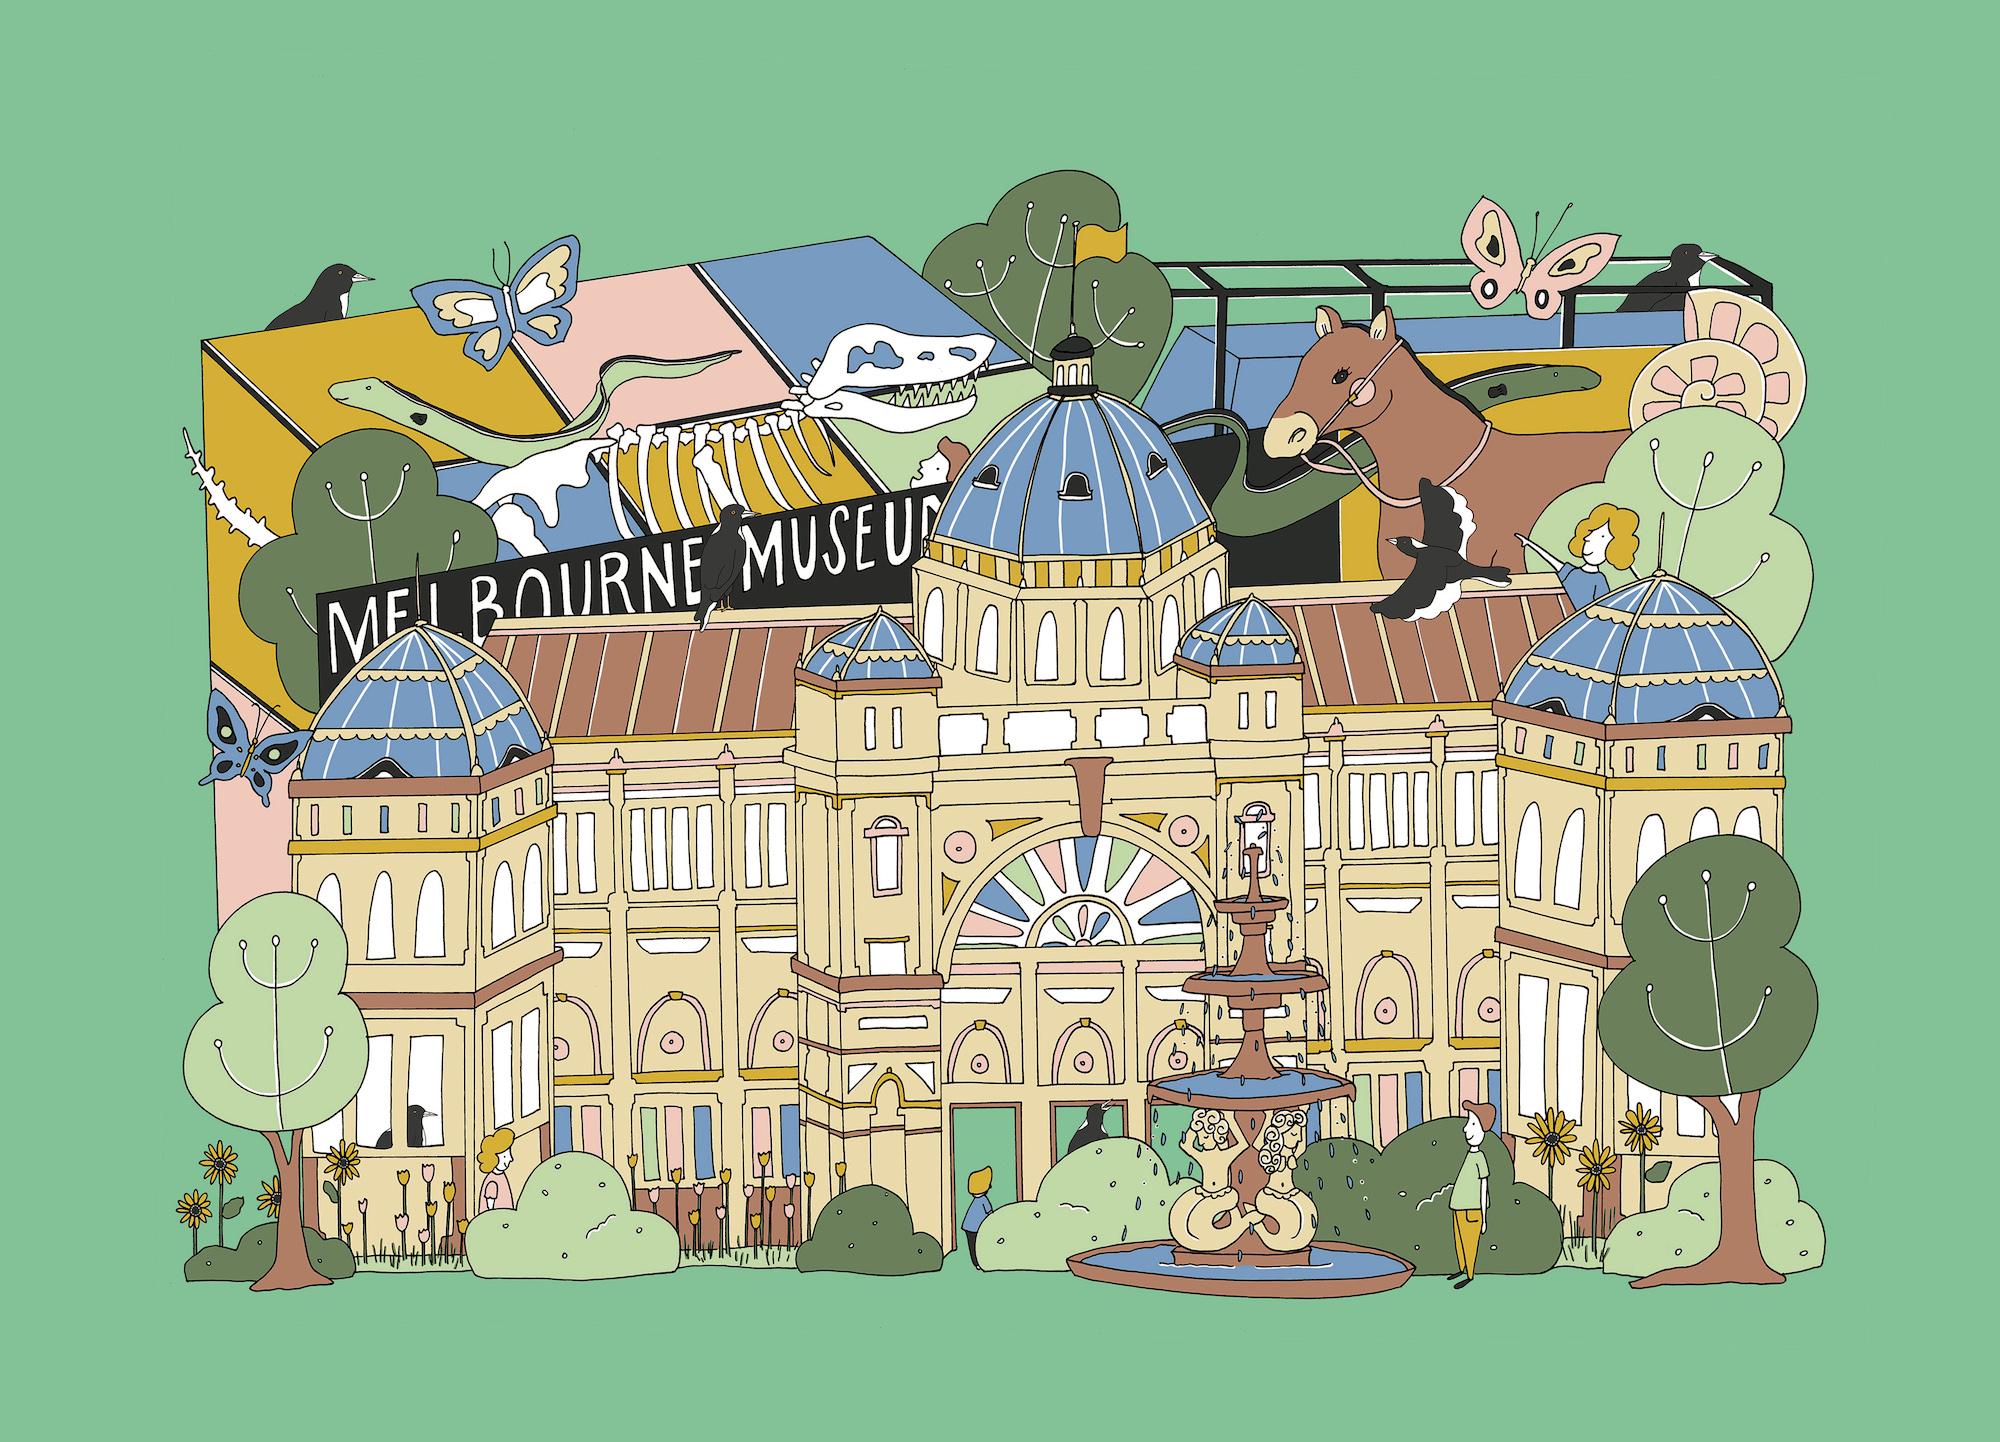 MeganMcKean_illustration_REB_Melbourne.jpg